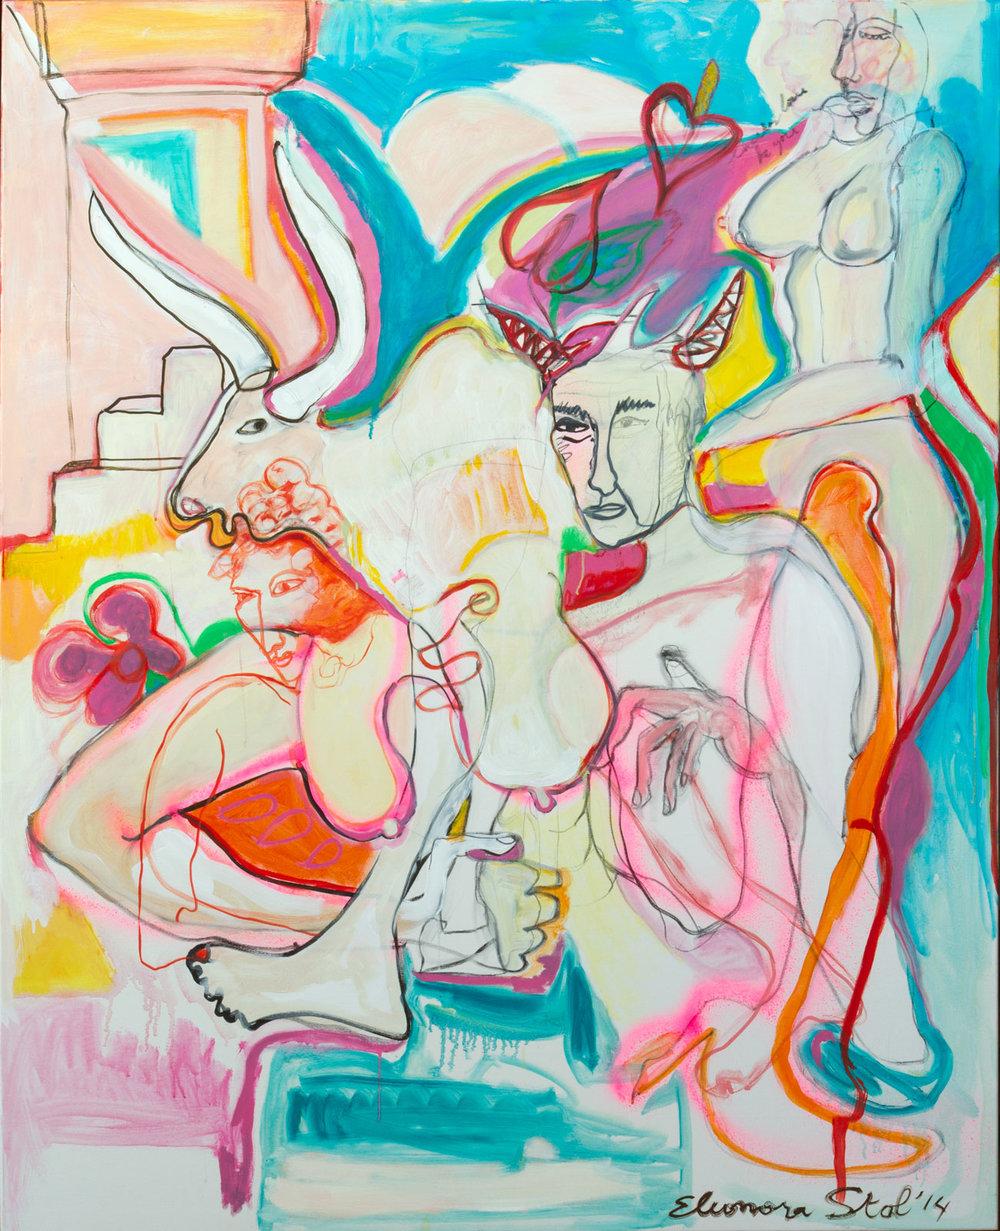 Eleonora-Stol, Roma con Amore, oil on canvas, 140 x 160, 2014.jpg